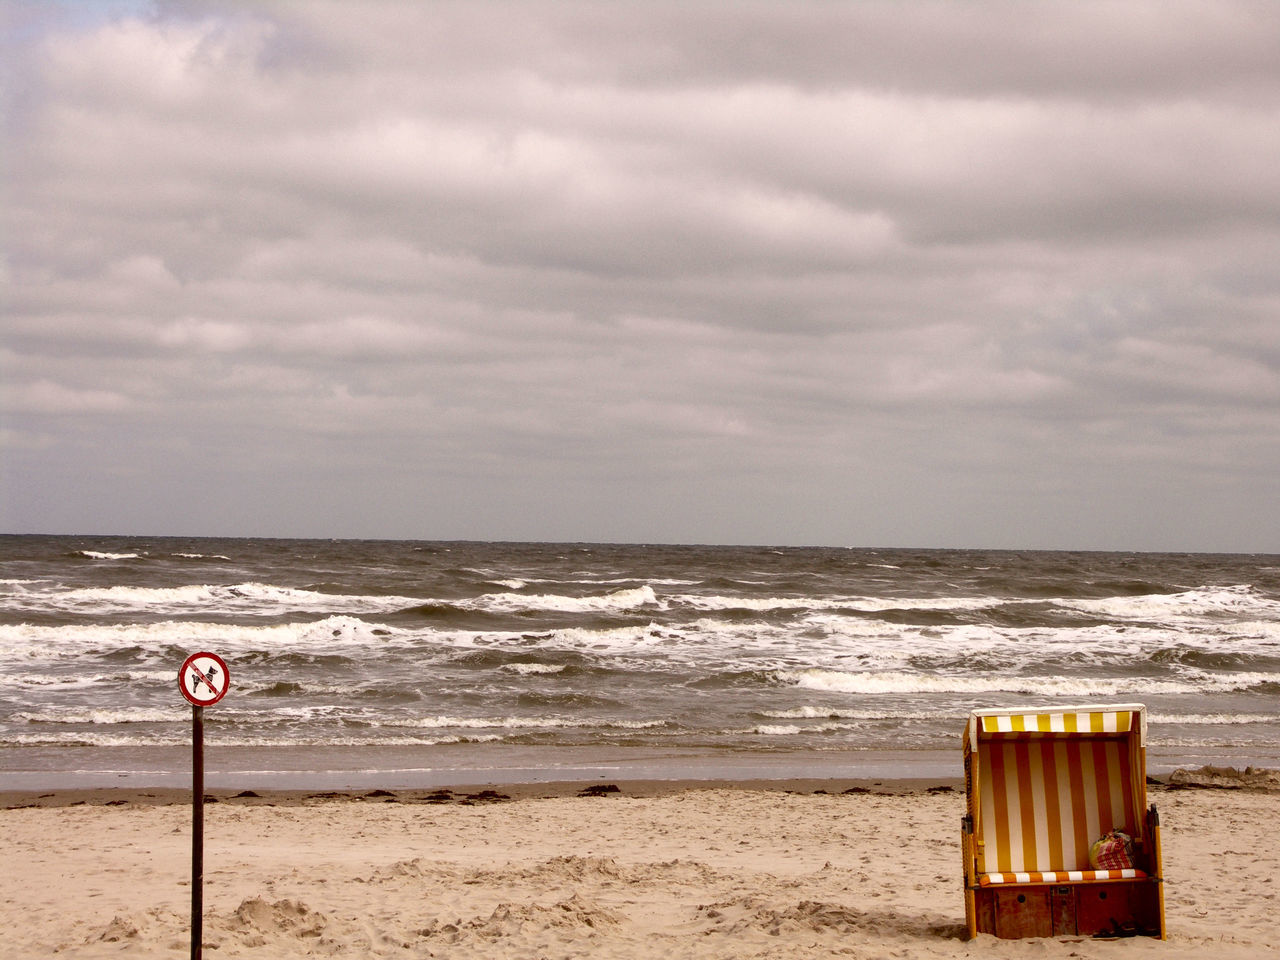 Beach Beach Chair Cloud - Sky Dark Clouds Horizon Over Water Insel Langeoog Nature No People Sand Sea Sky Strand ♥ Strandkorb Water